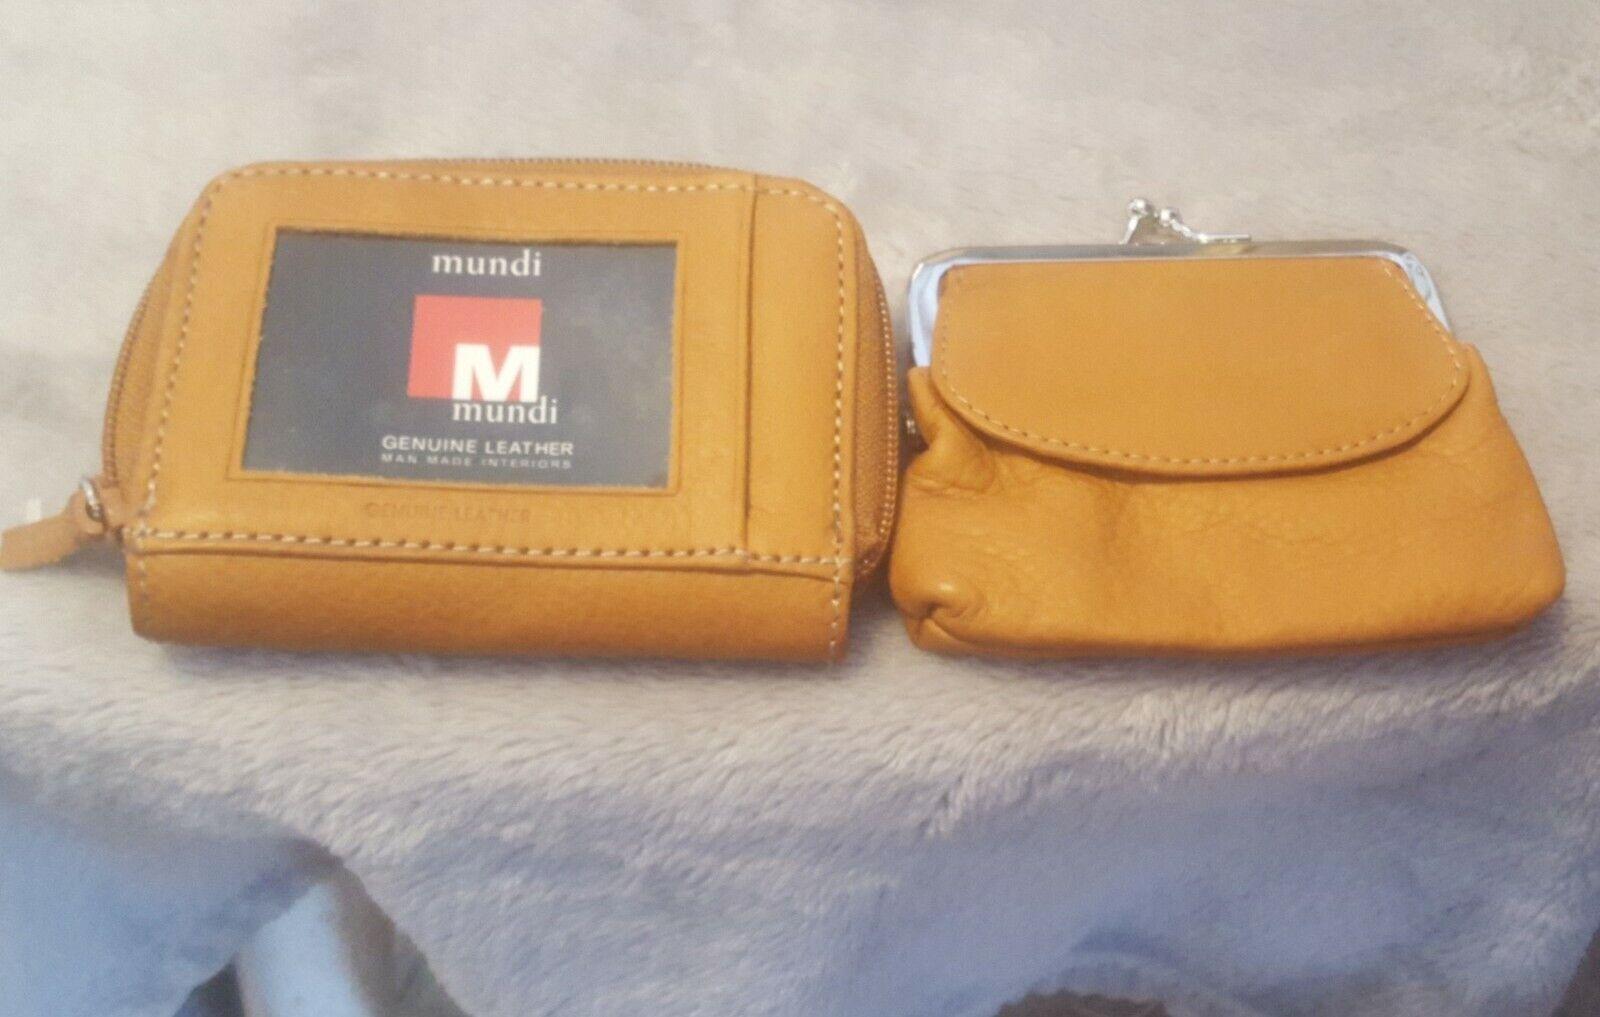 "New Mundi Brown Leather Change Purse Coin Wallet Zipper Closure 4.5"" x 3.5"""